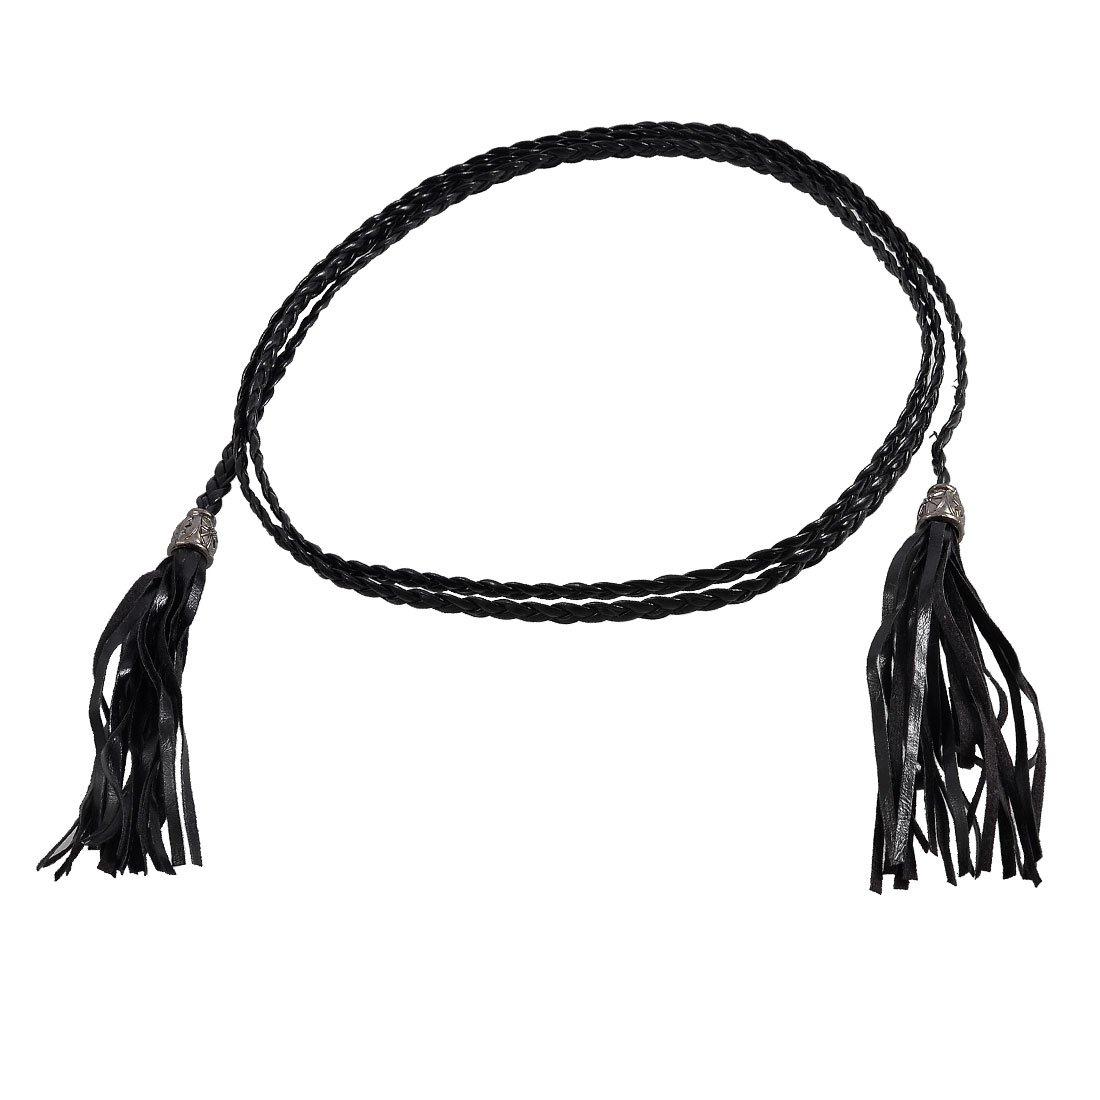 25s8 Tassel Detailing Braided Faux Leather Waist Belt Band